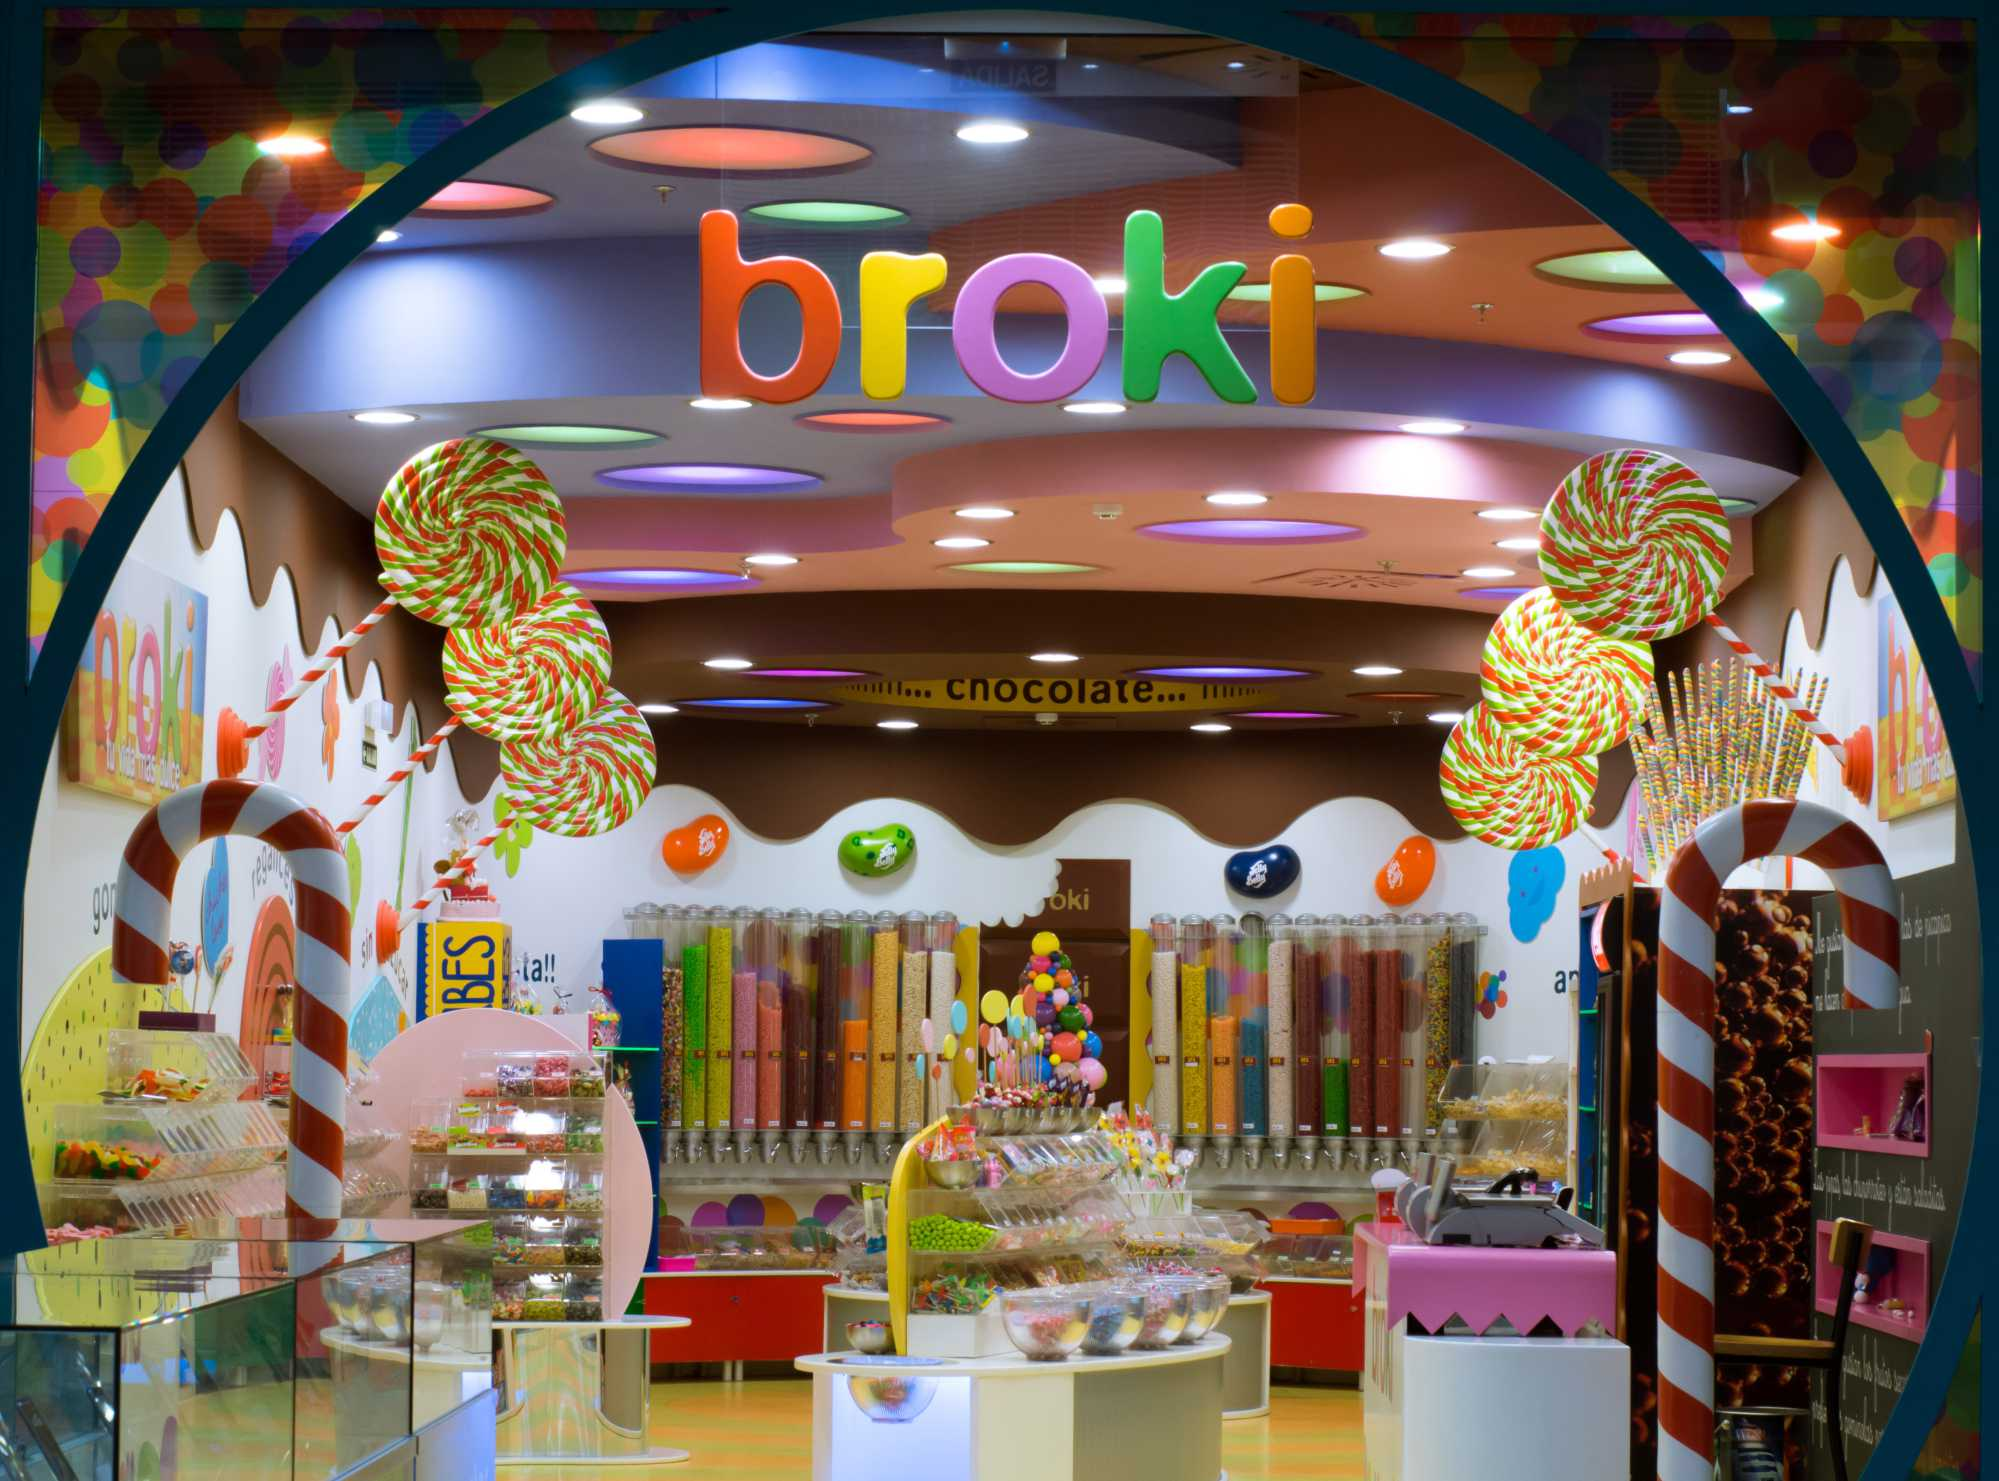 10-Broki03